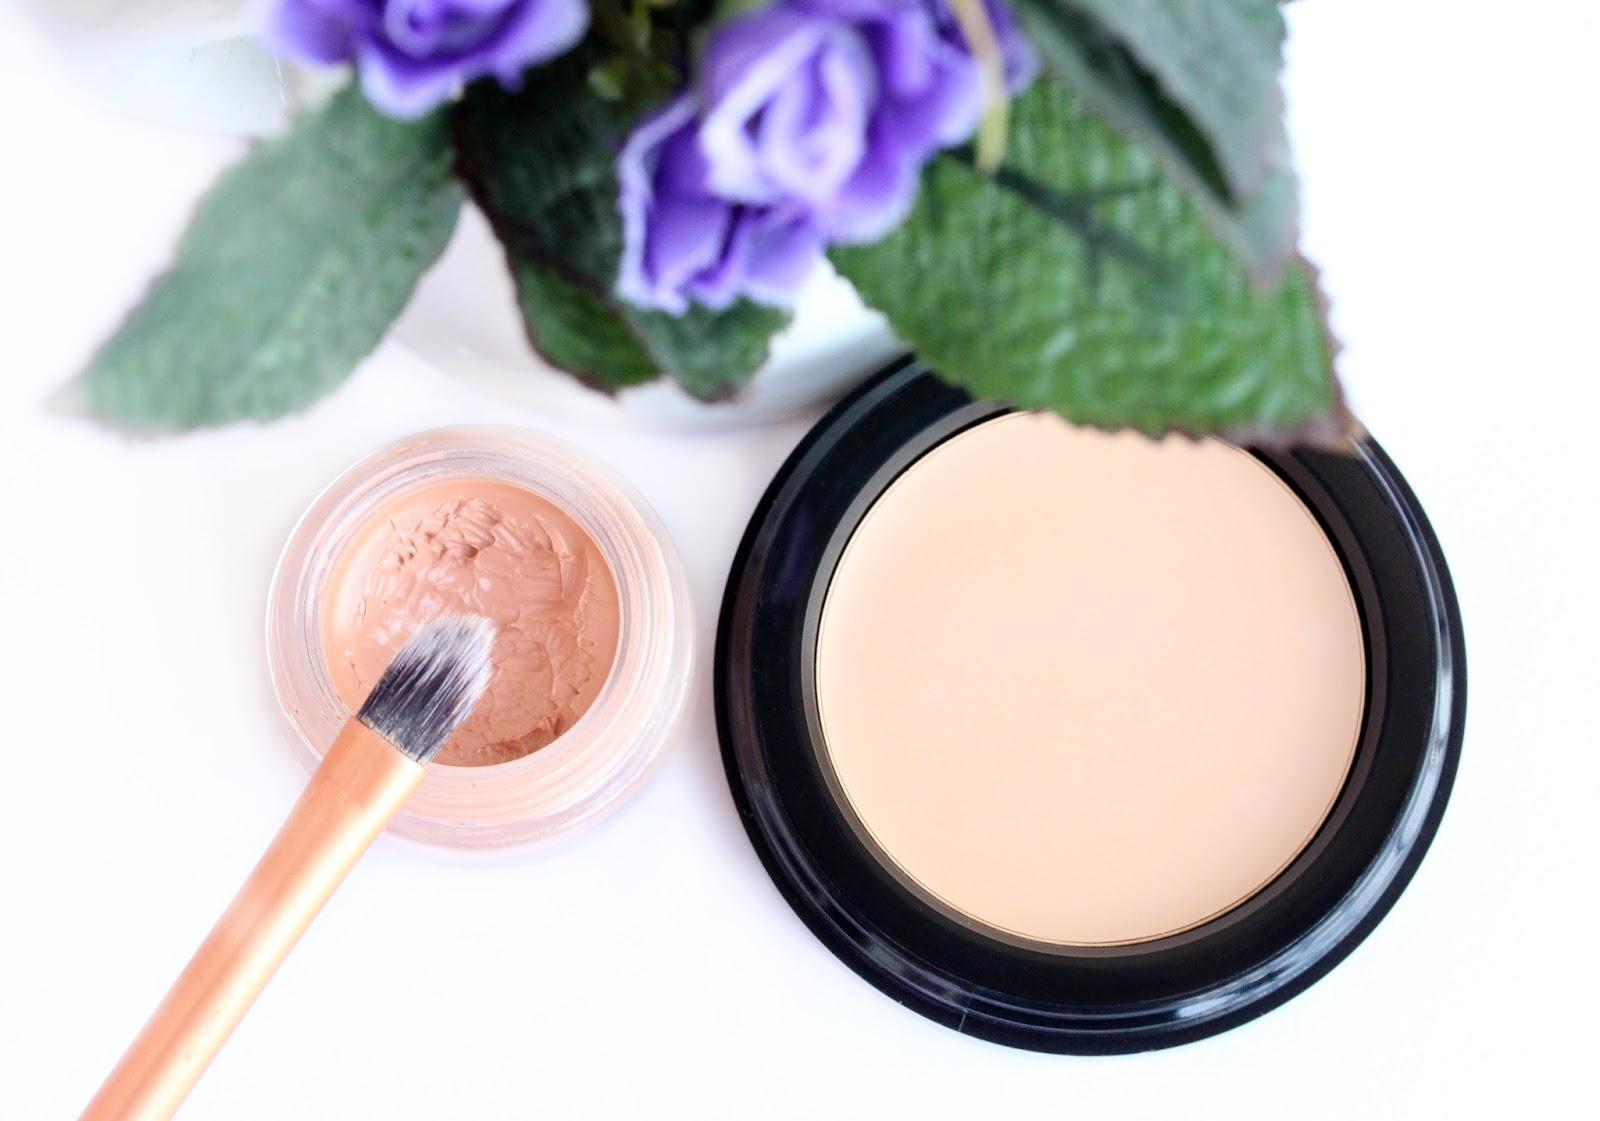 Benefit Erase Paste and Boi-Ing Concealers